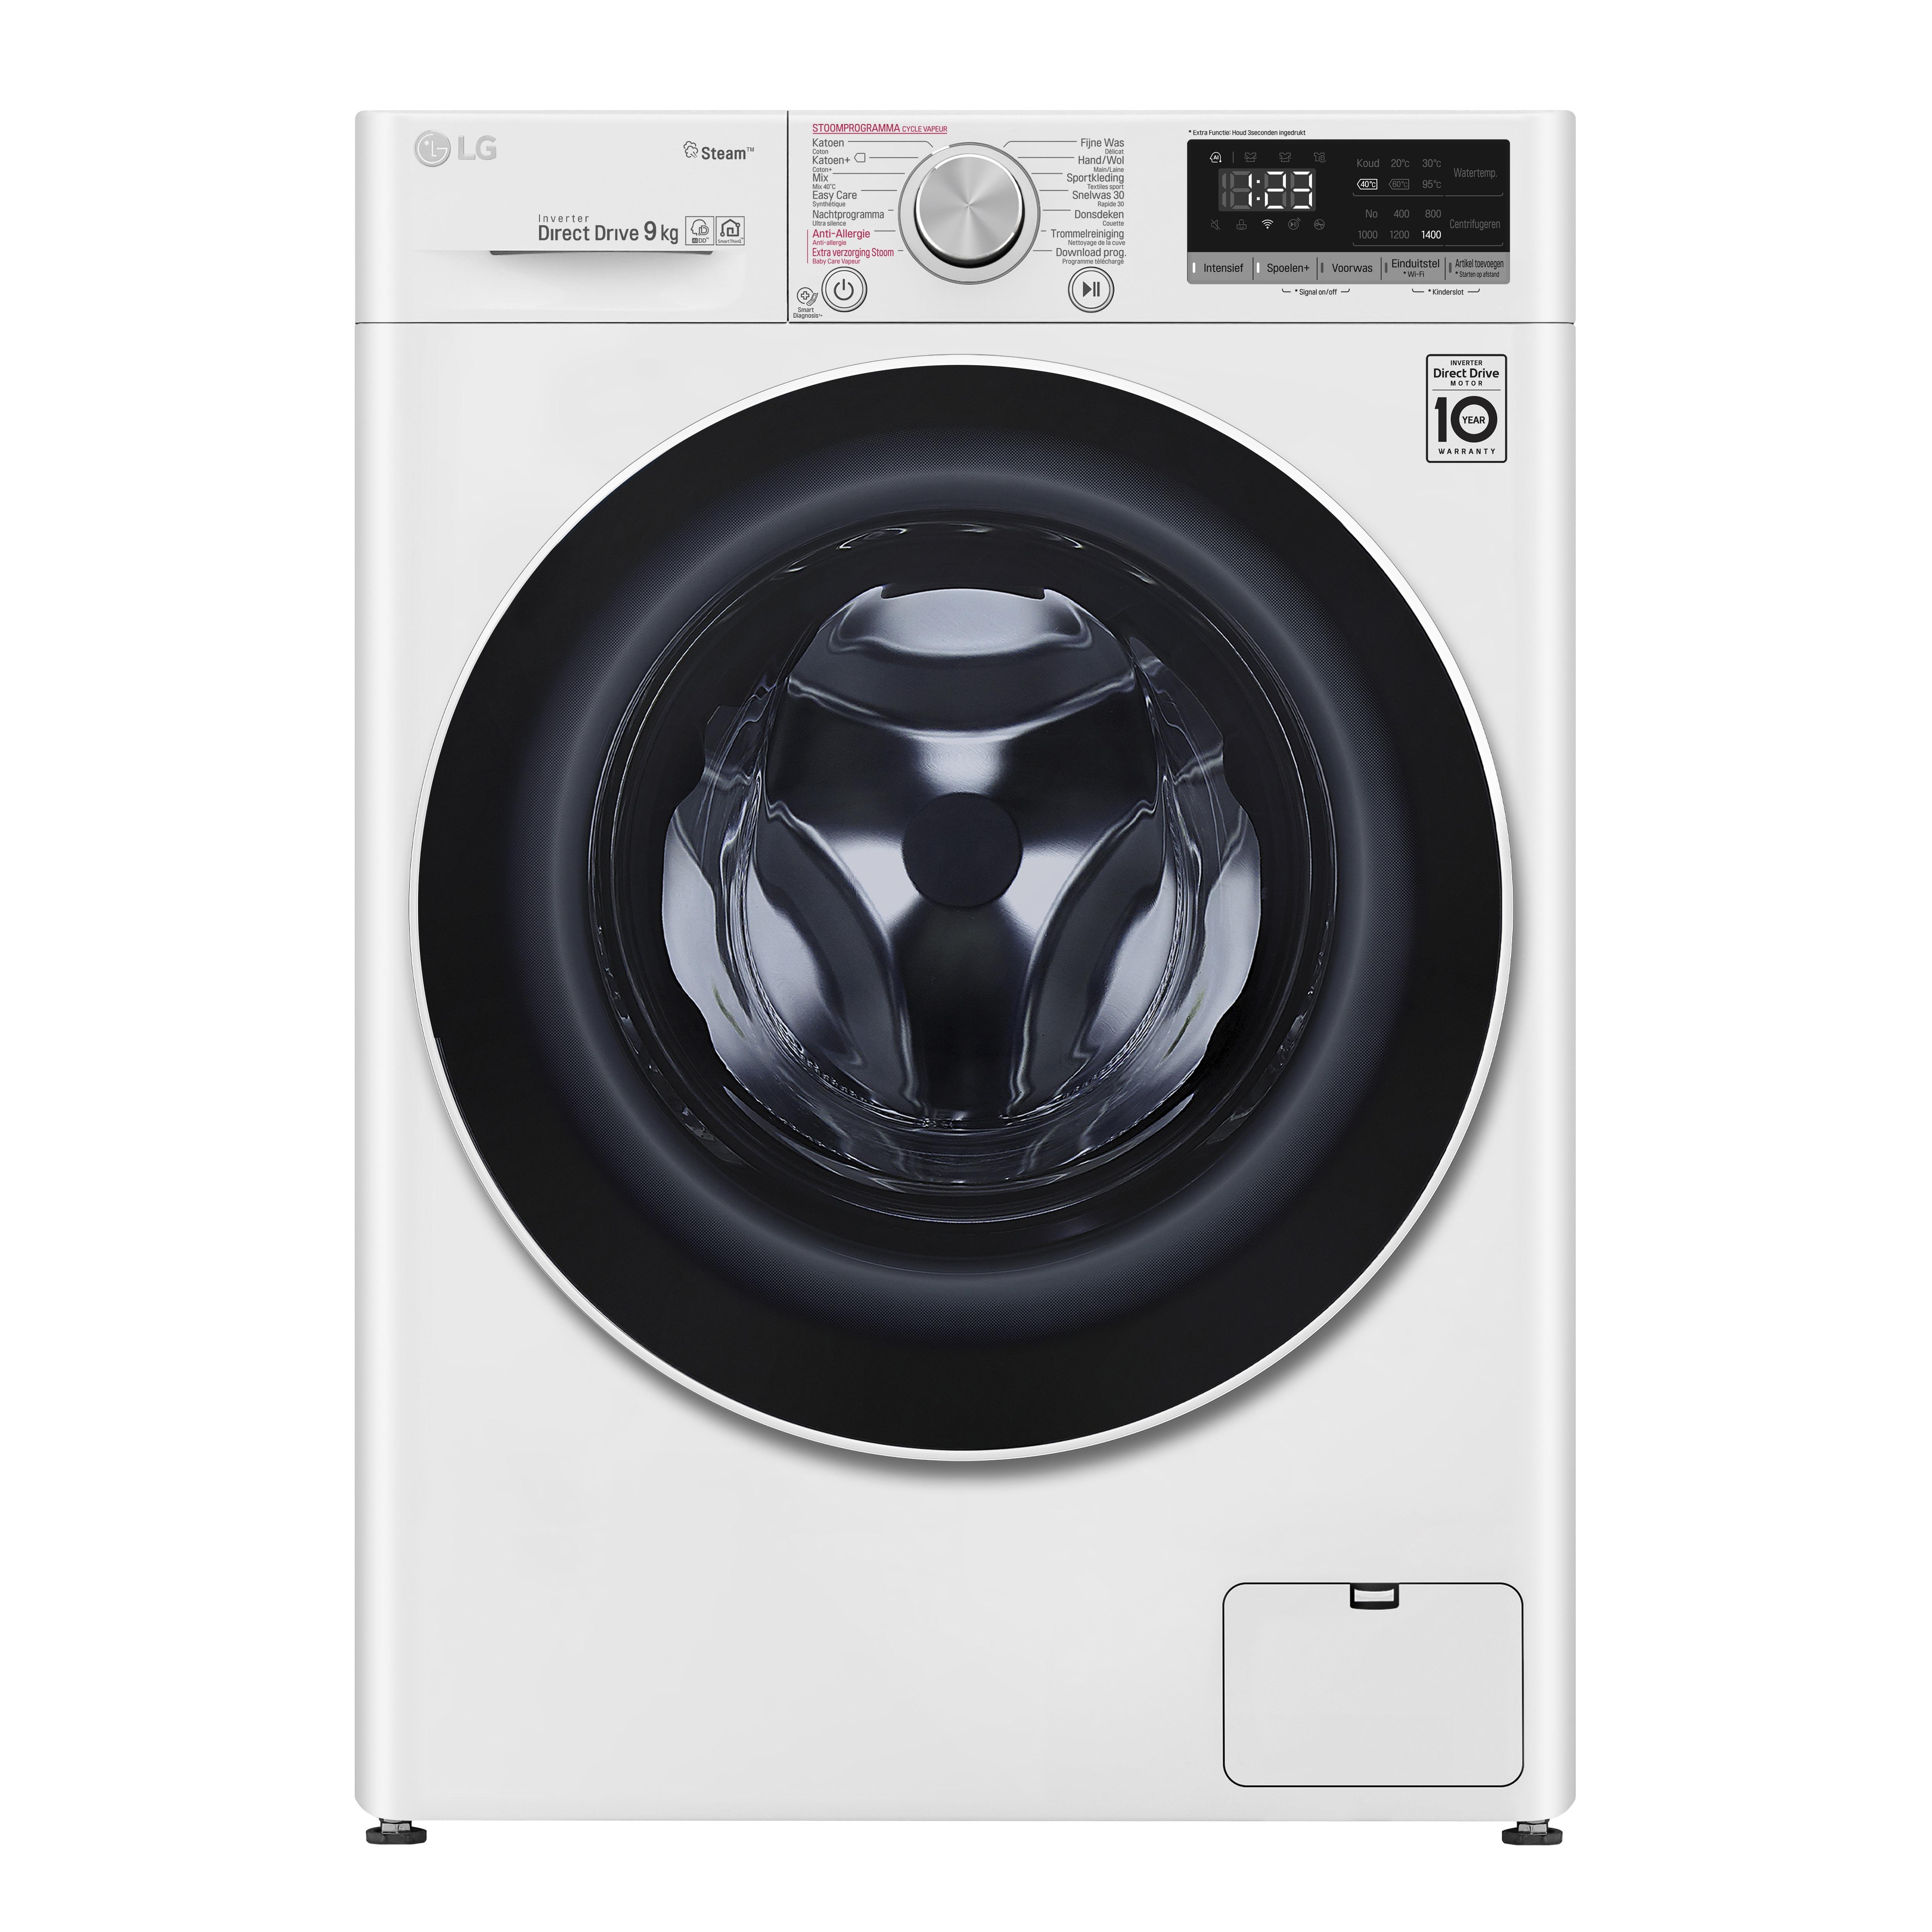 LG F4WN509S0 Wasmachine